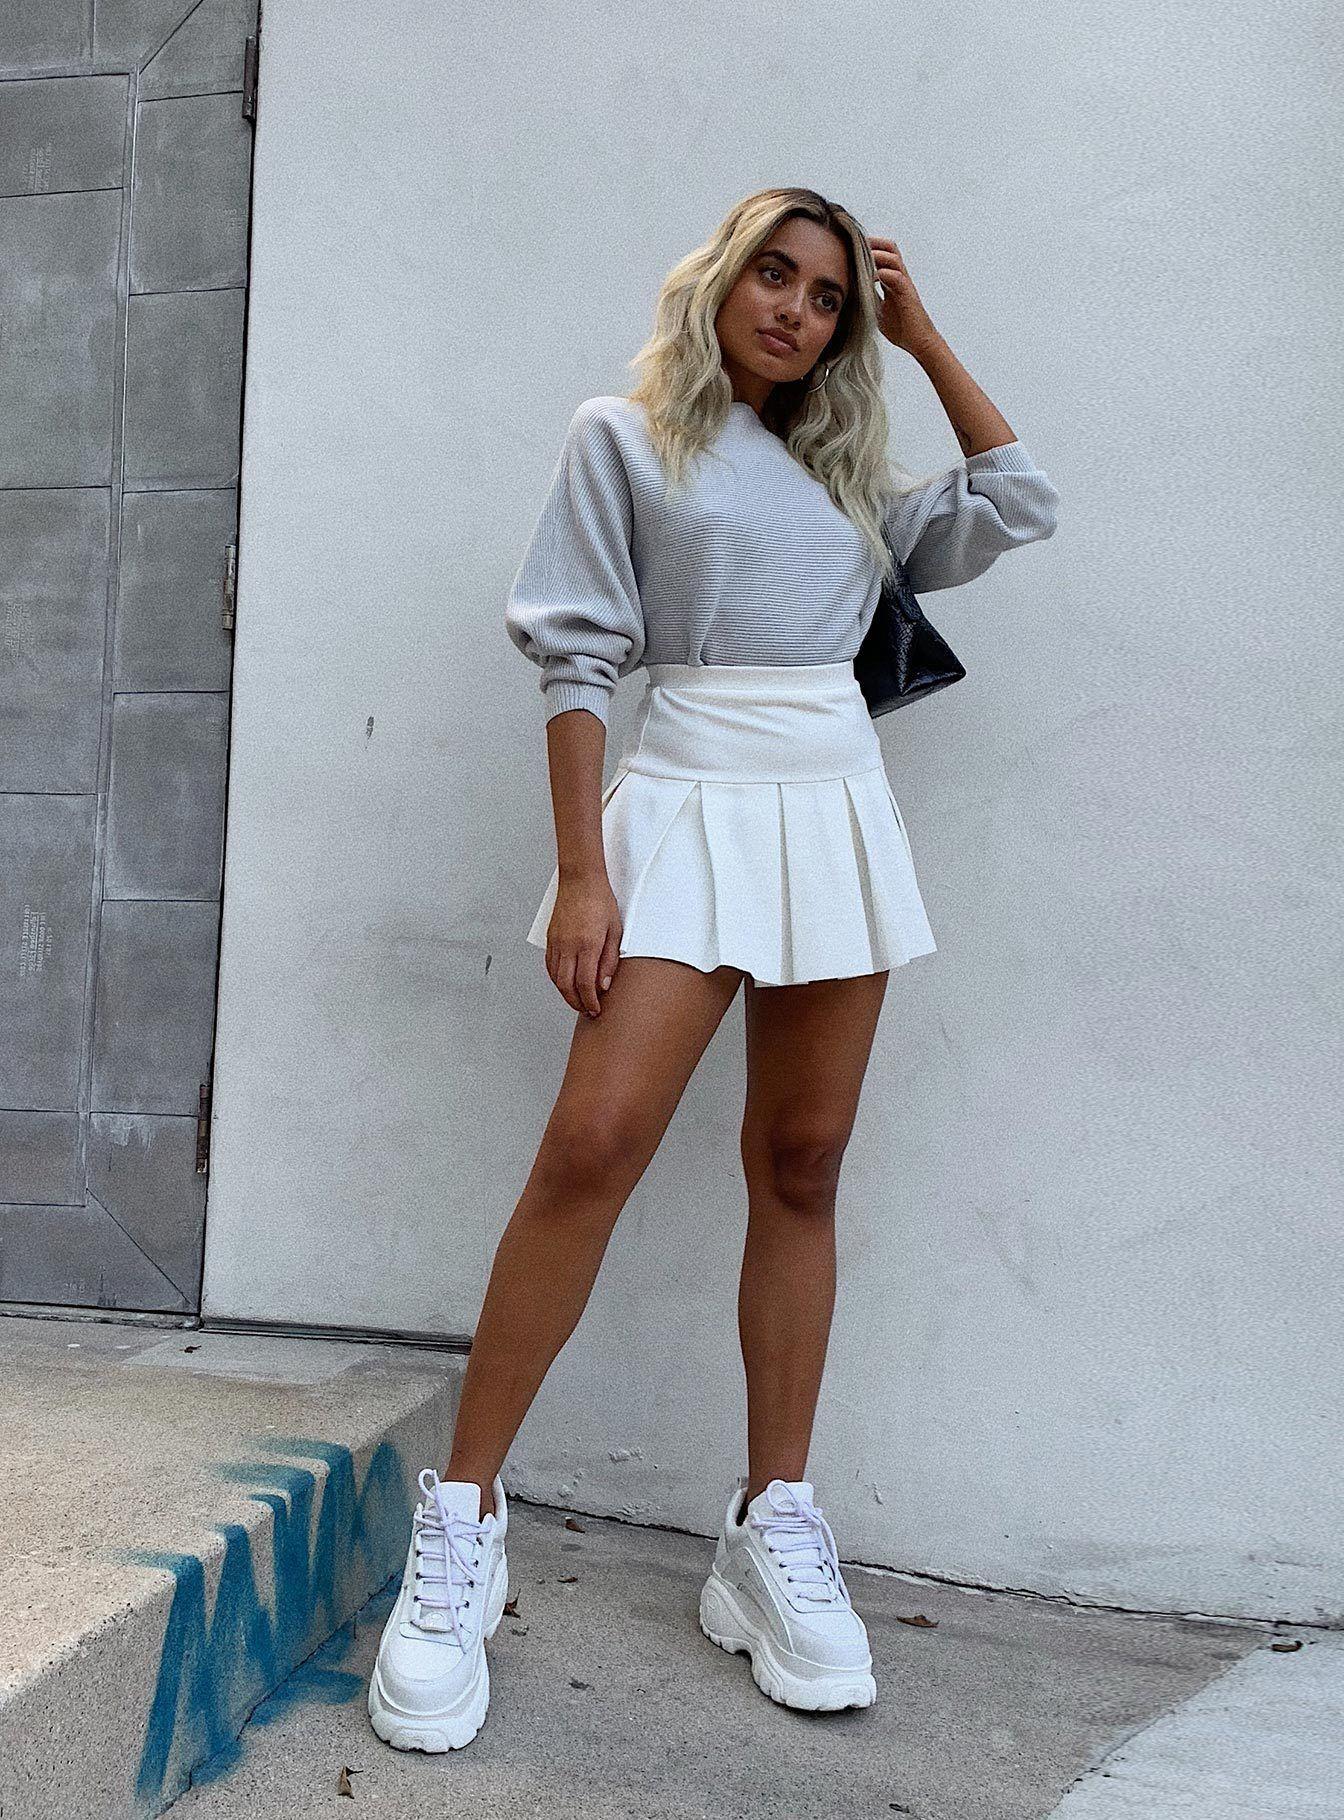 Mini Skirts Ideas Of Mini Skirts Miniskirts In 2020 Tennis Skirt Outfit Pleated Mini Skirt Mini Skirts